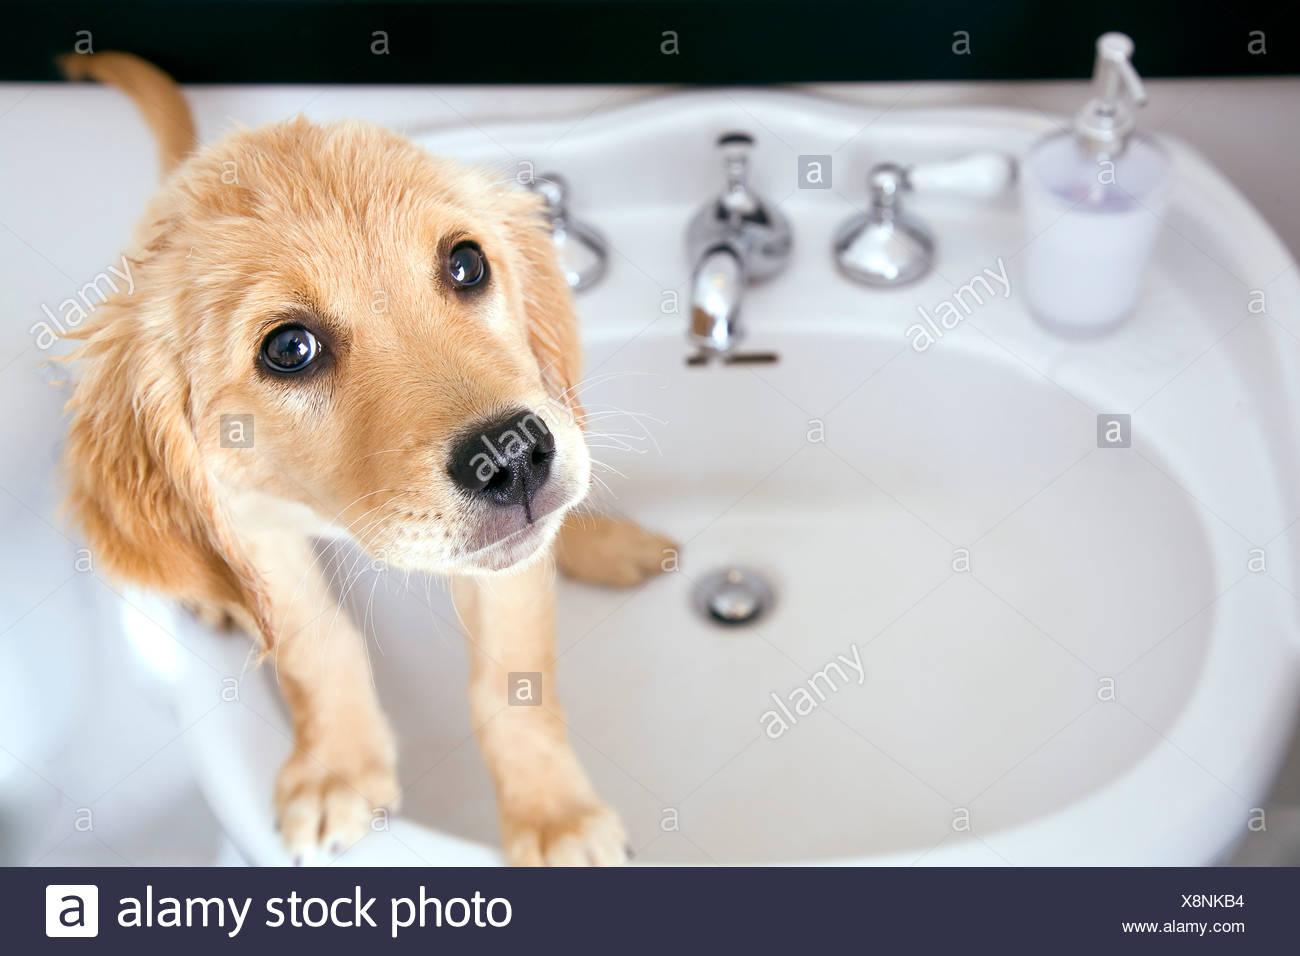 Dog In Sink